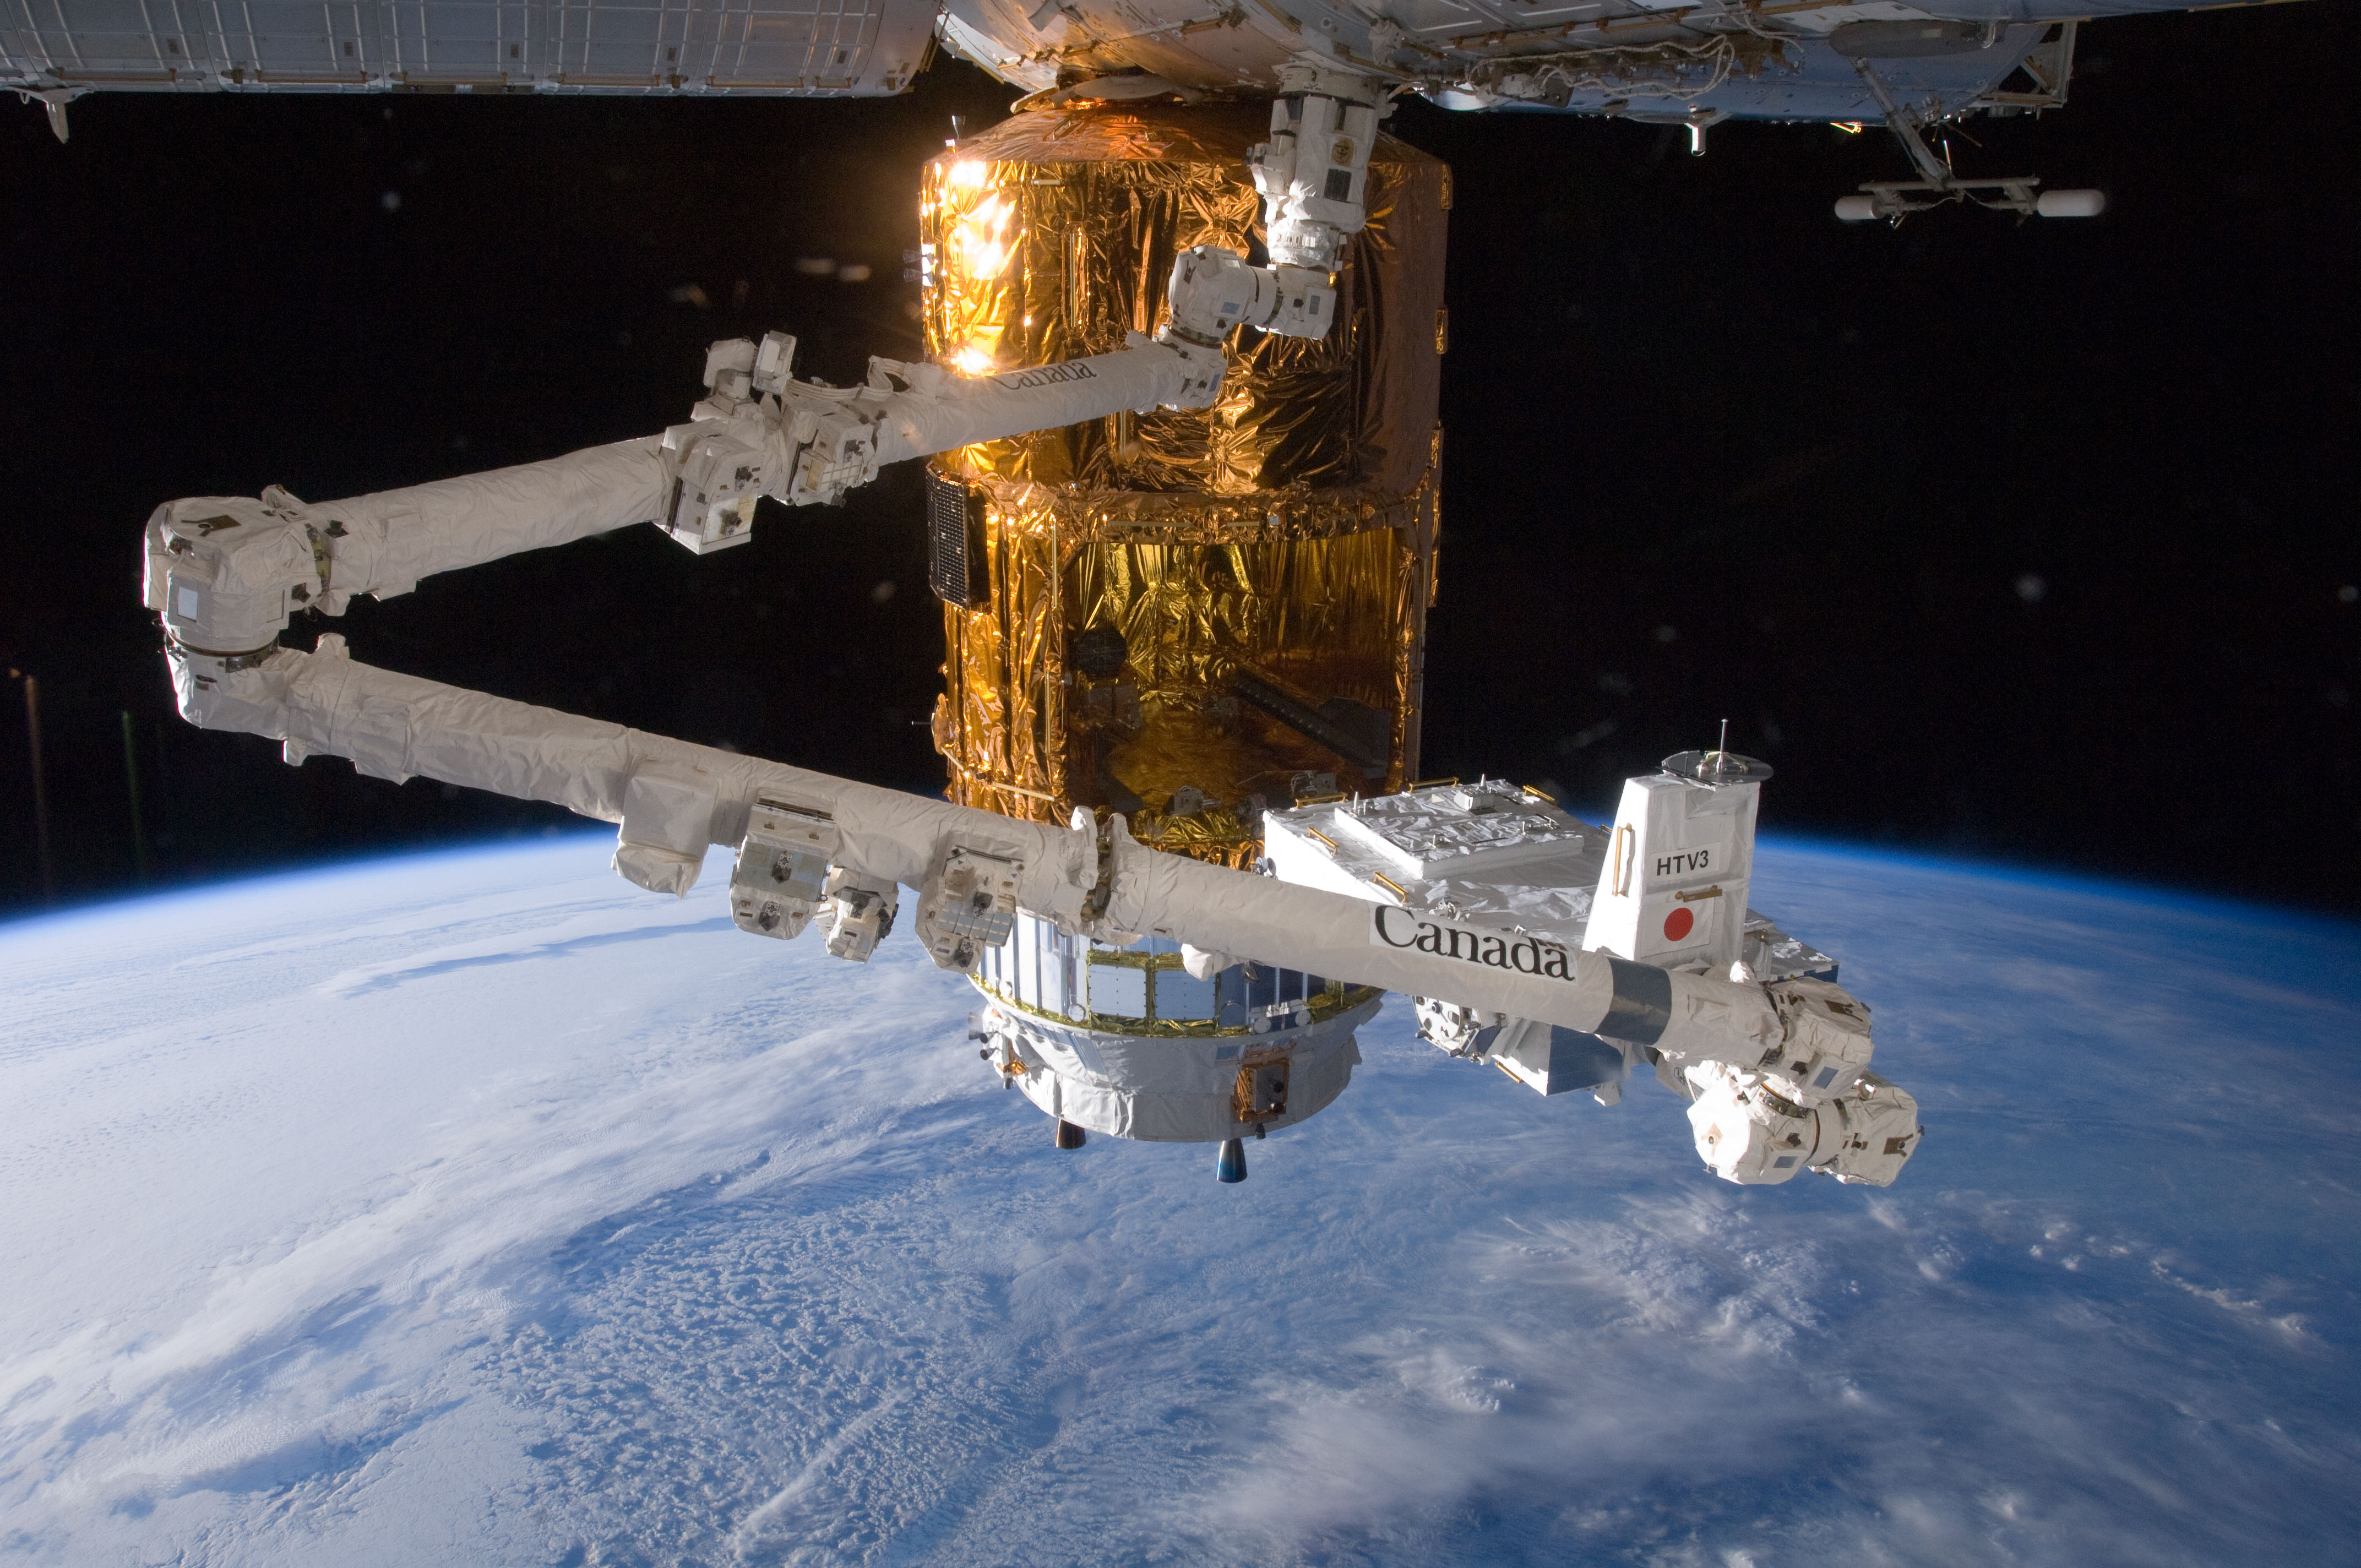 NASA - Canadarm2 and HTV-3